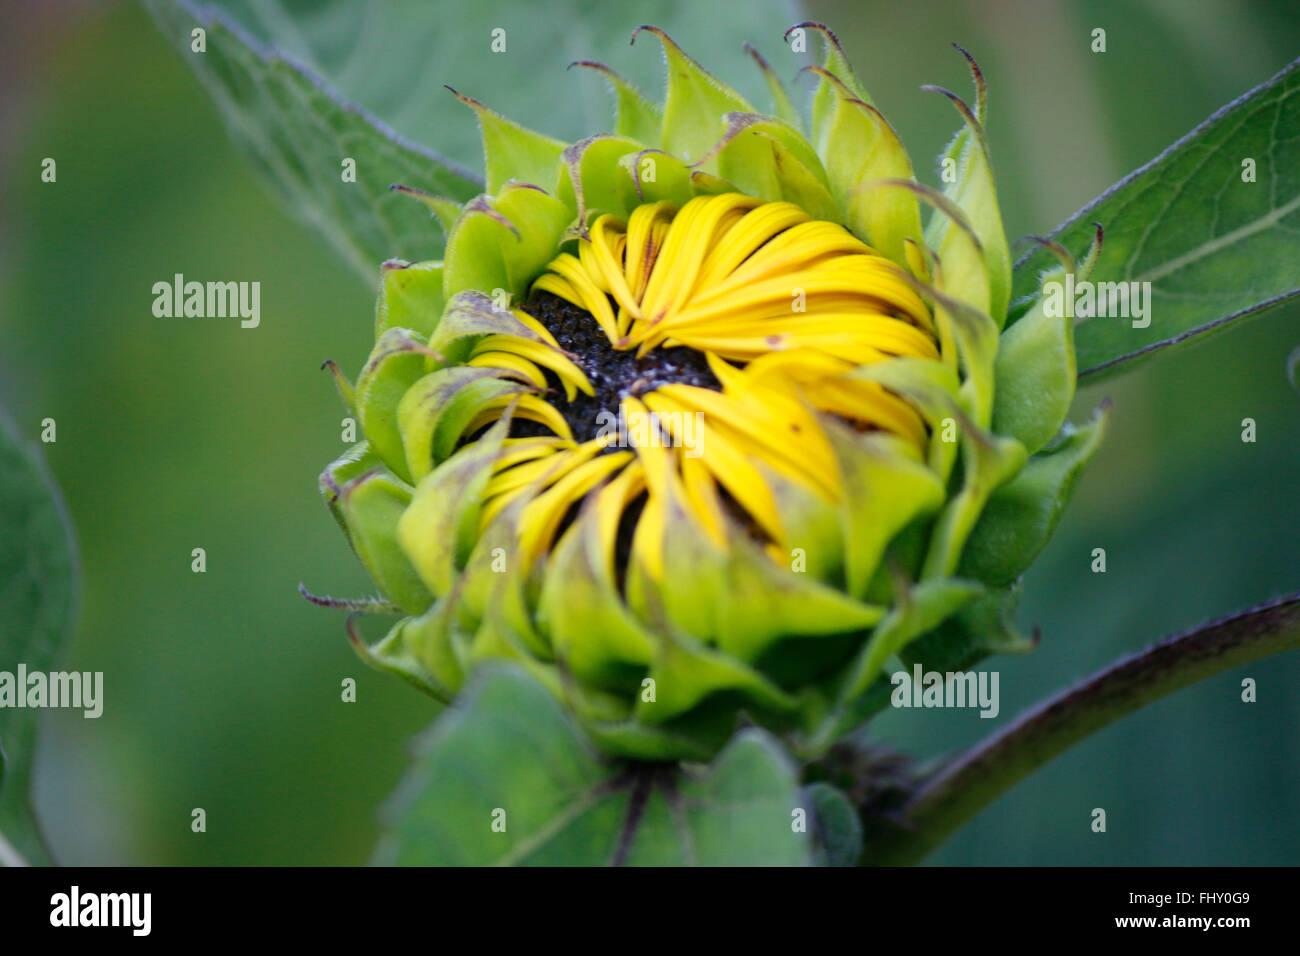 Sonnenblume - spaetsommerlicher Garten, Berlin. - Stock Image